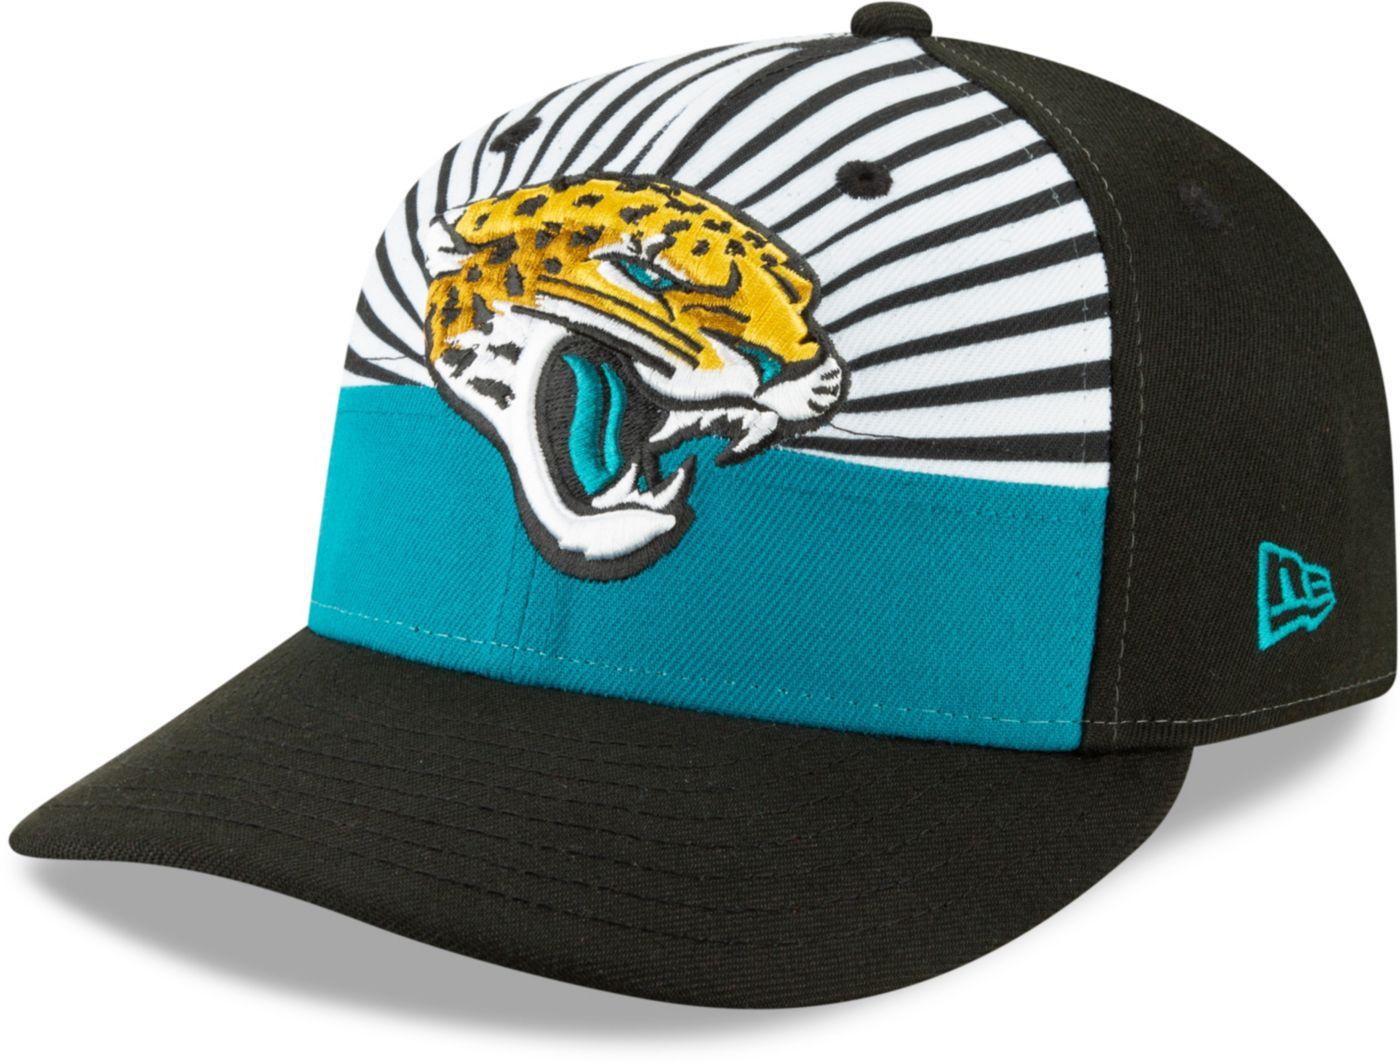 New Era Men's Jacksonville Jaguars 2019 NFL Draft 59Fifty Fitted Black Hat